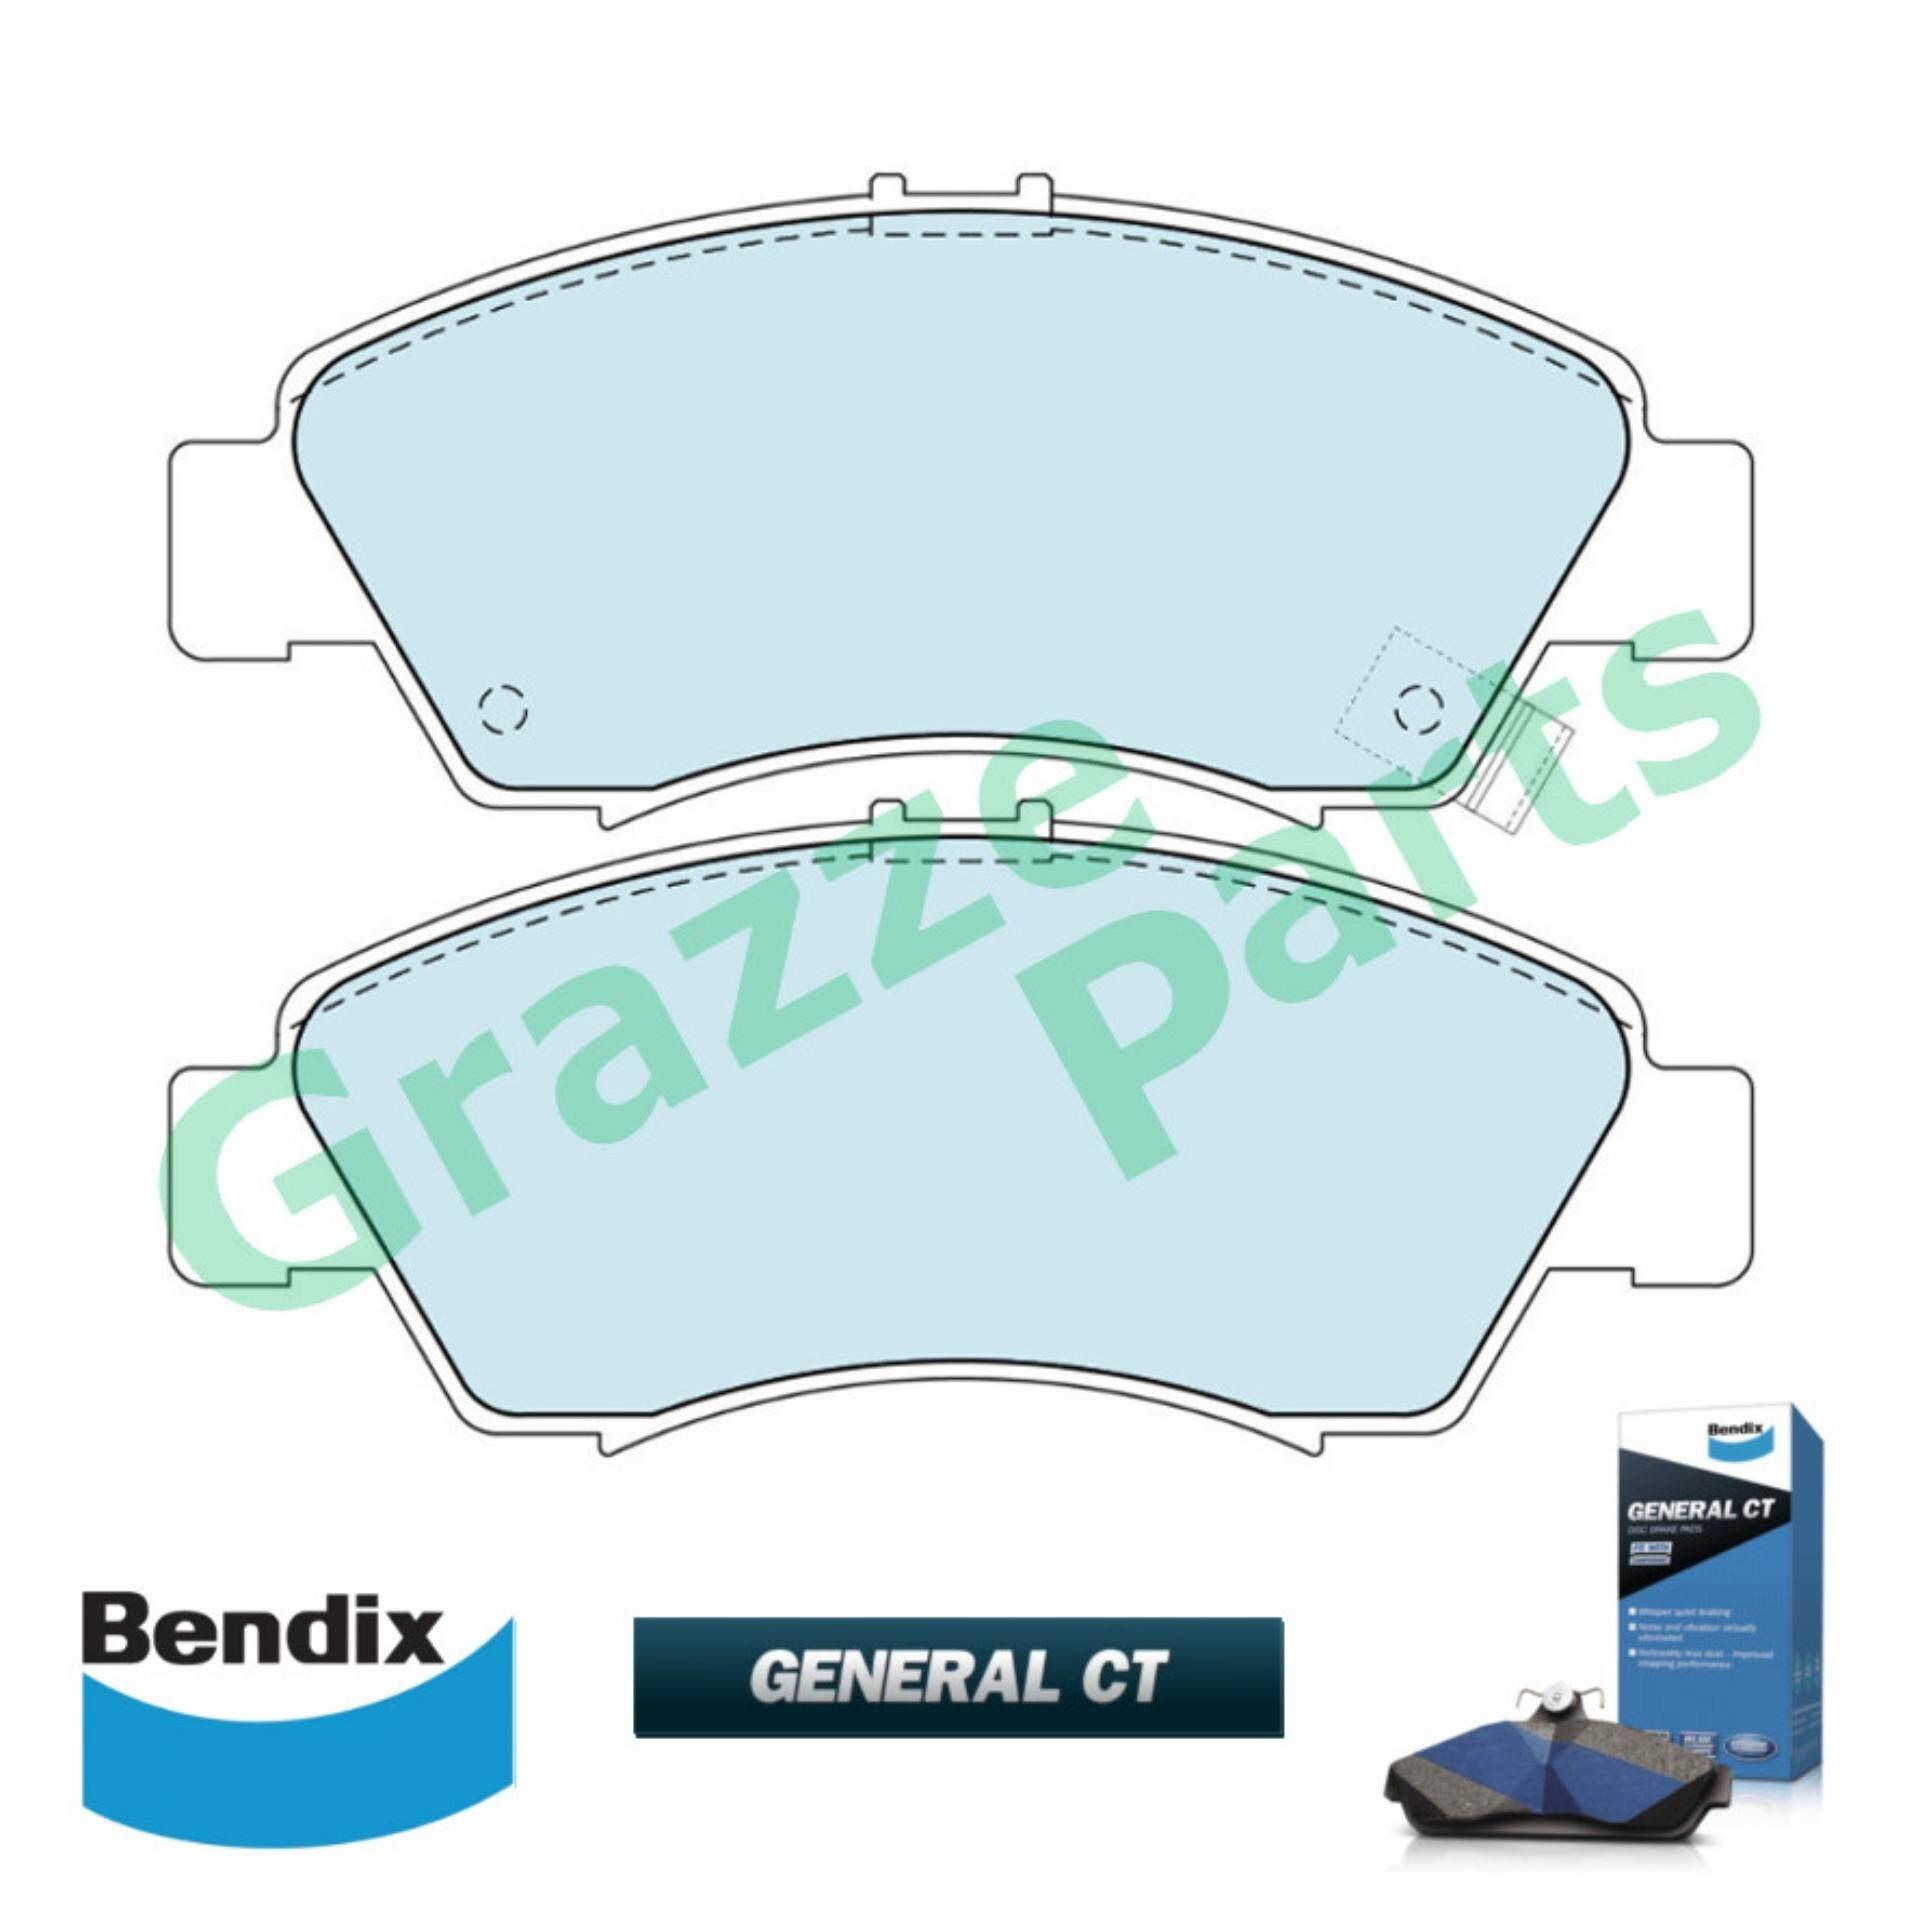 Bendix General CT Disc Brake Pad Front for DB1262 - Honda City SEL Jazz Civic SR4 SO4